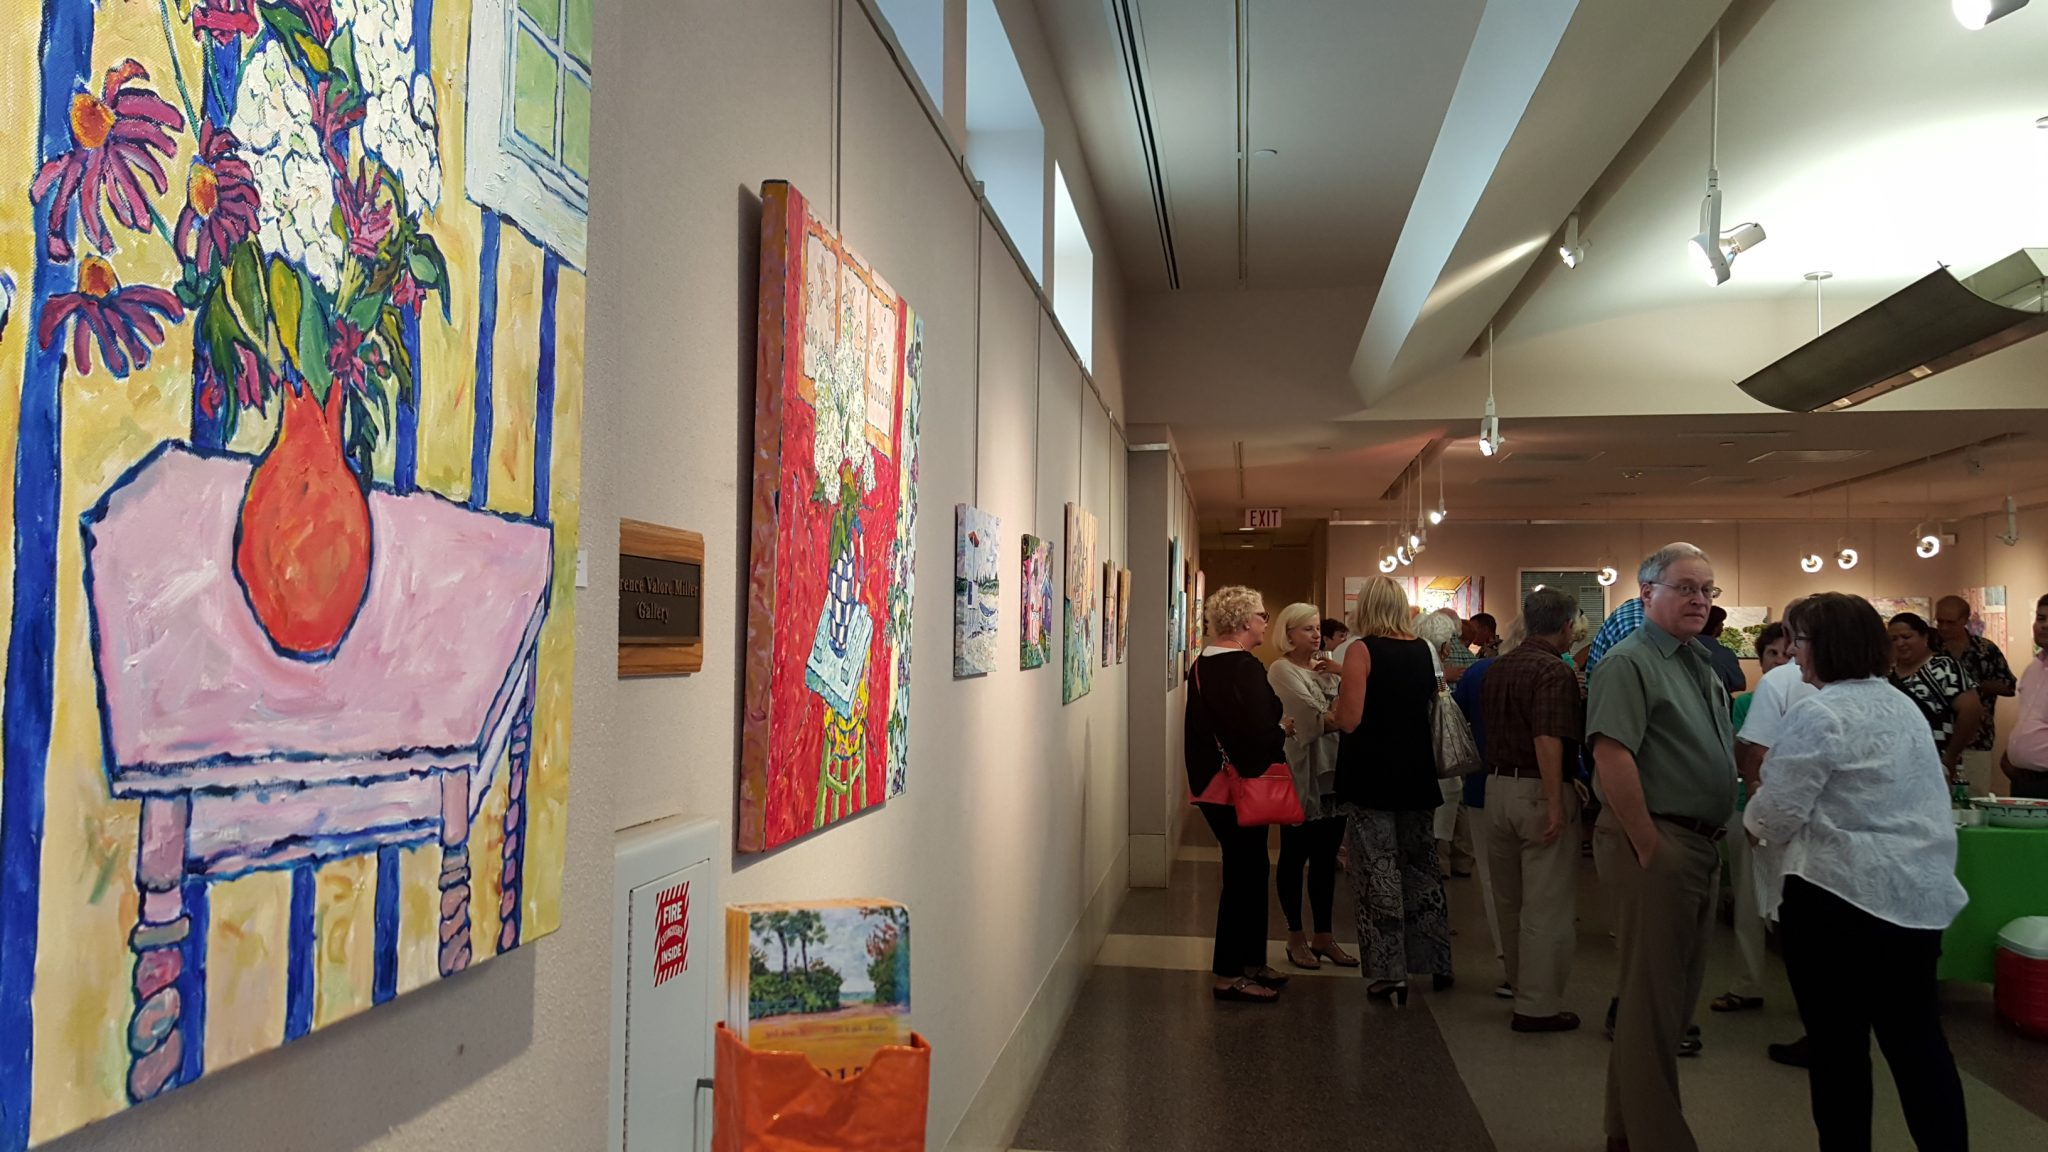 2014 Garden Pier Art Gallery Opening - Artist Popo Flannigan